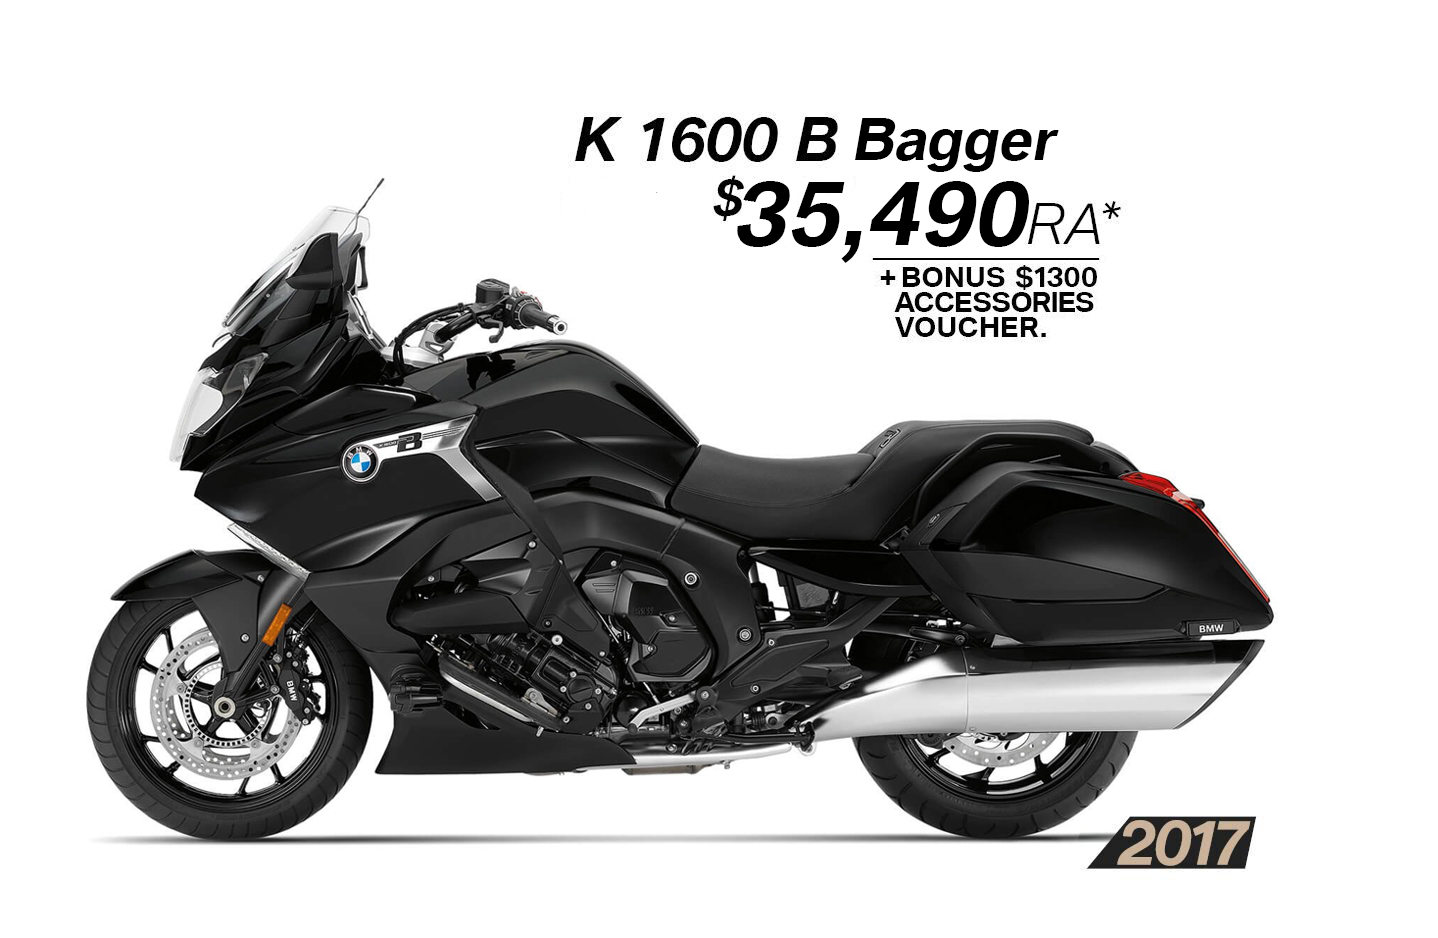 2017 K 1600 B Bagger